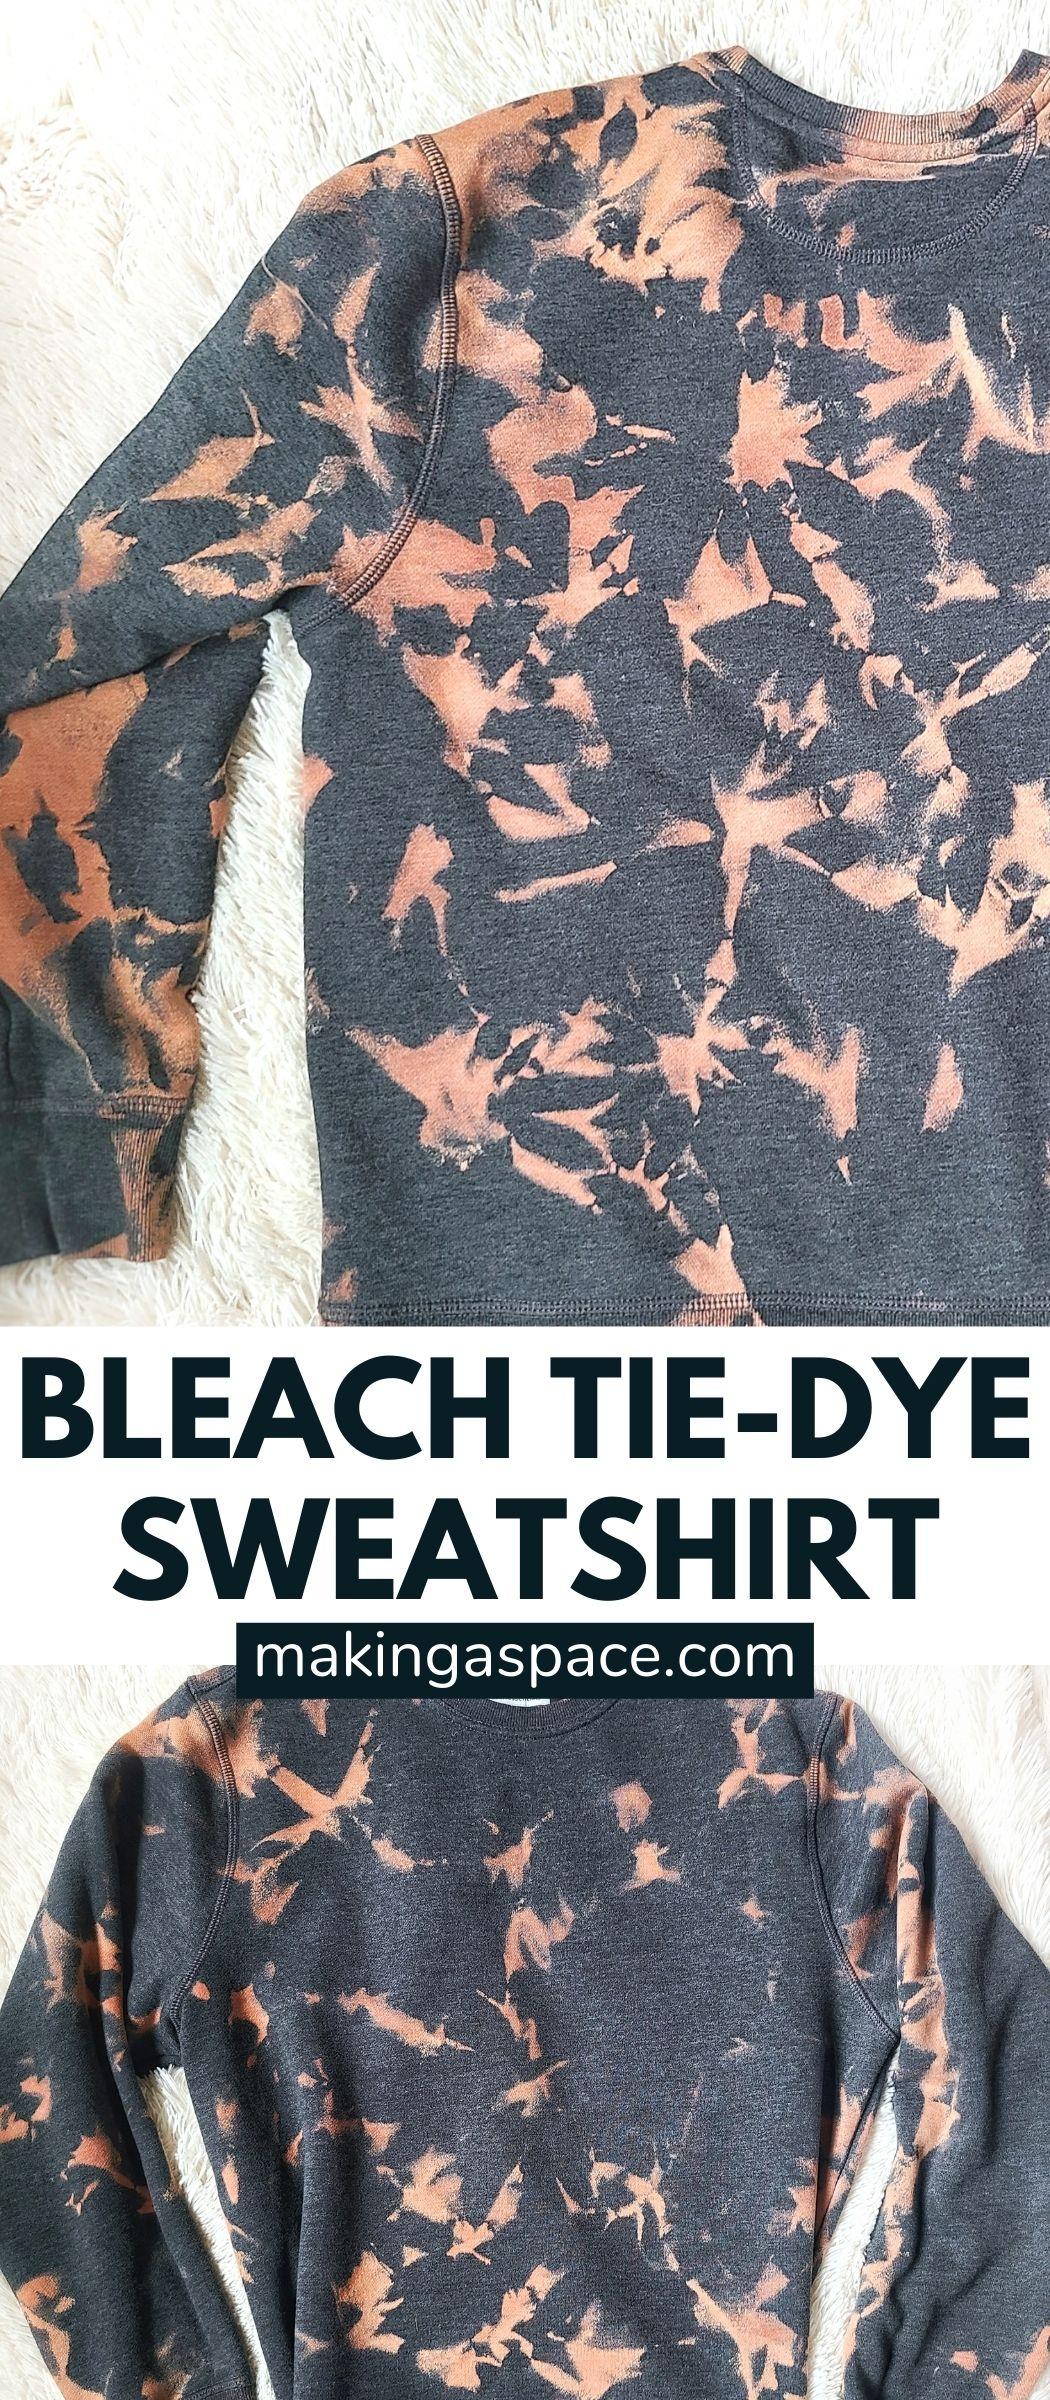 bleach tie-dying a sweatshirt